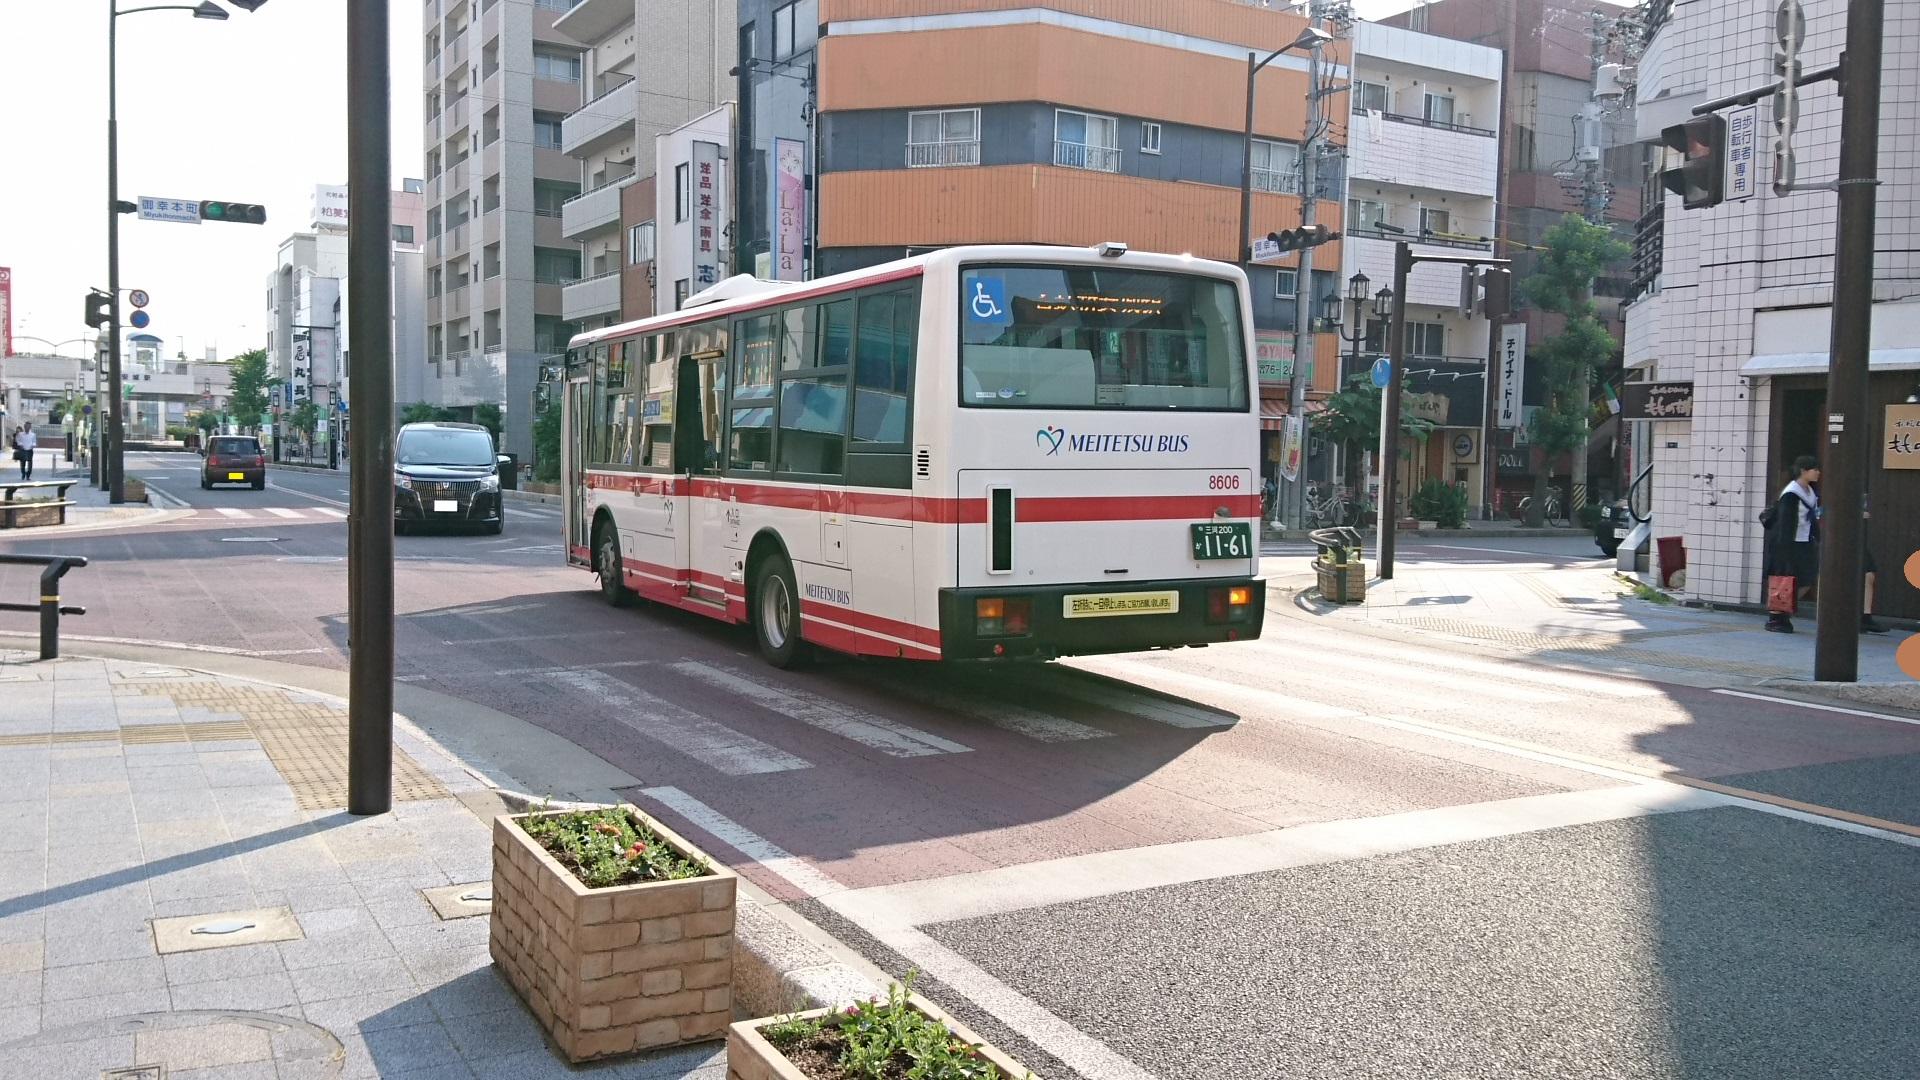 2017.6.16 御幸本町交差点 - 名鉄バス (2) 1920-1080